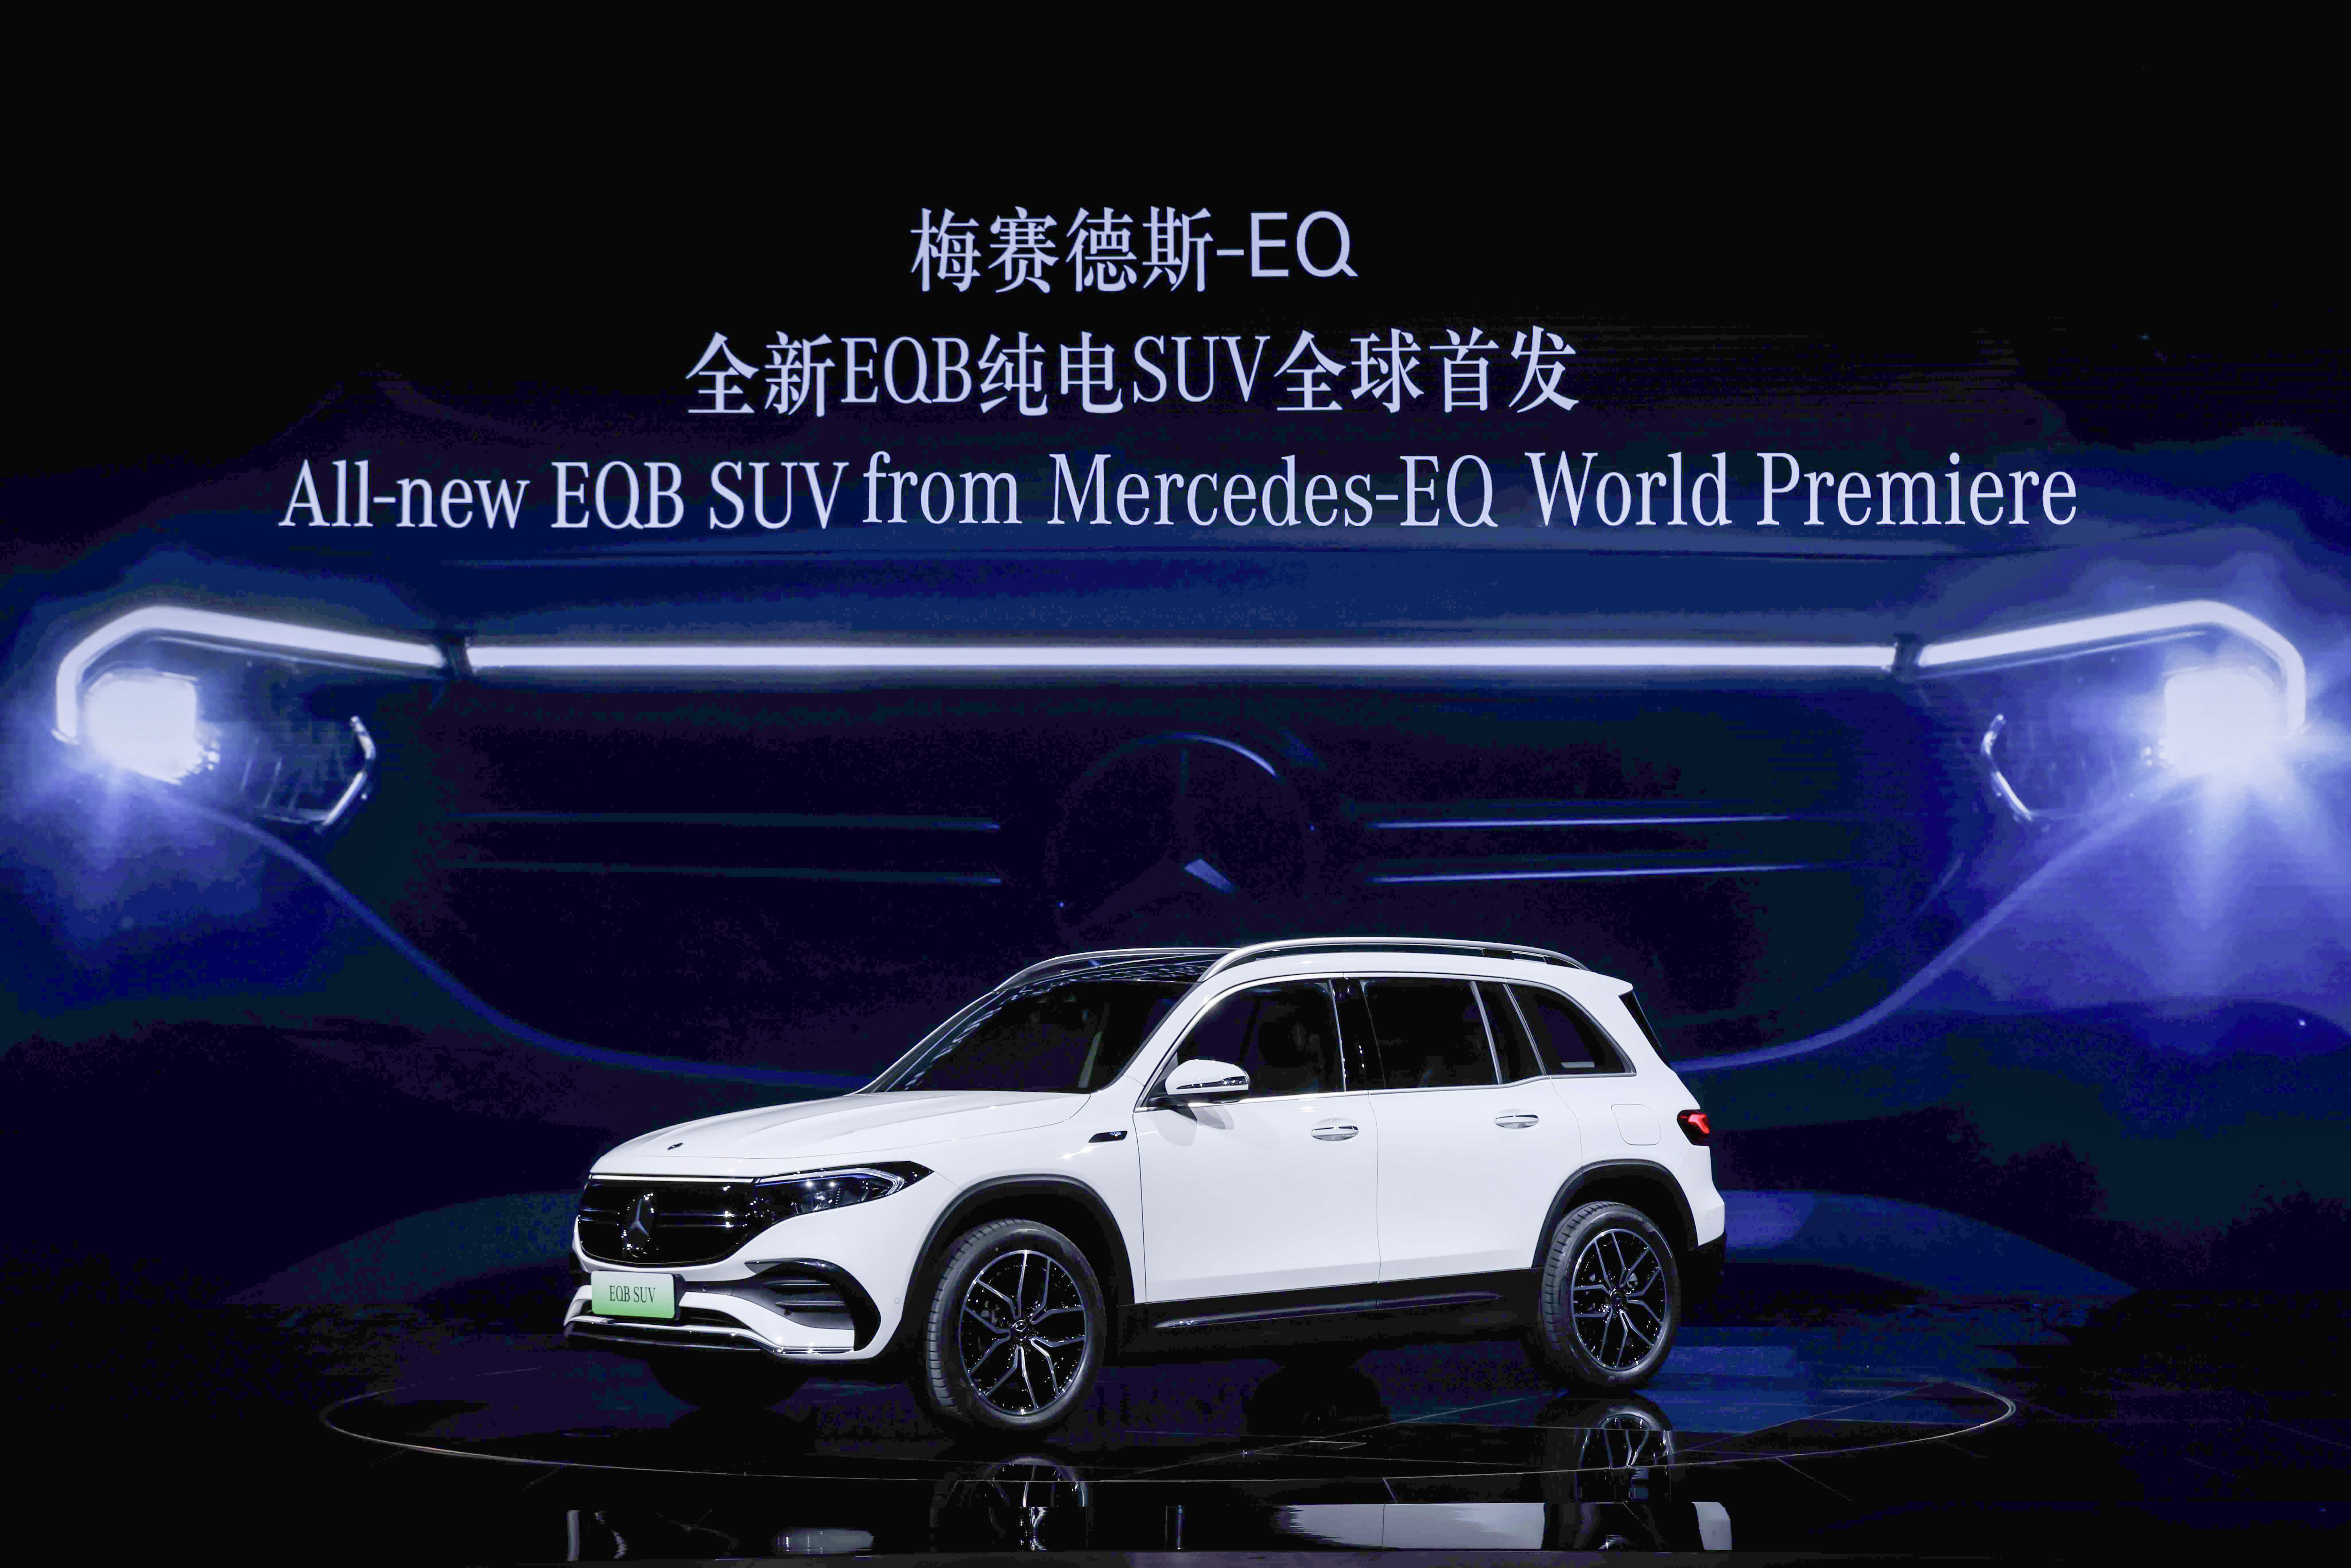 Mercedes-Benz's new EQB Shanghai auto show2021